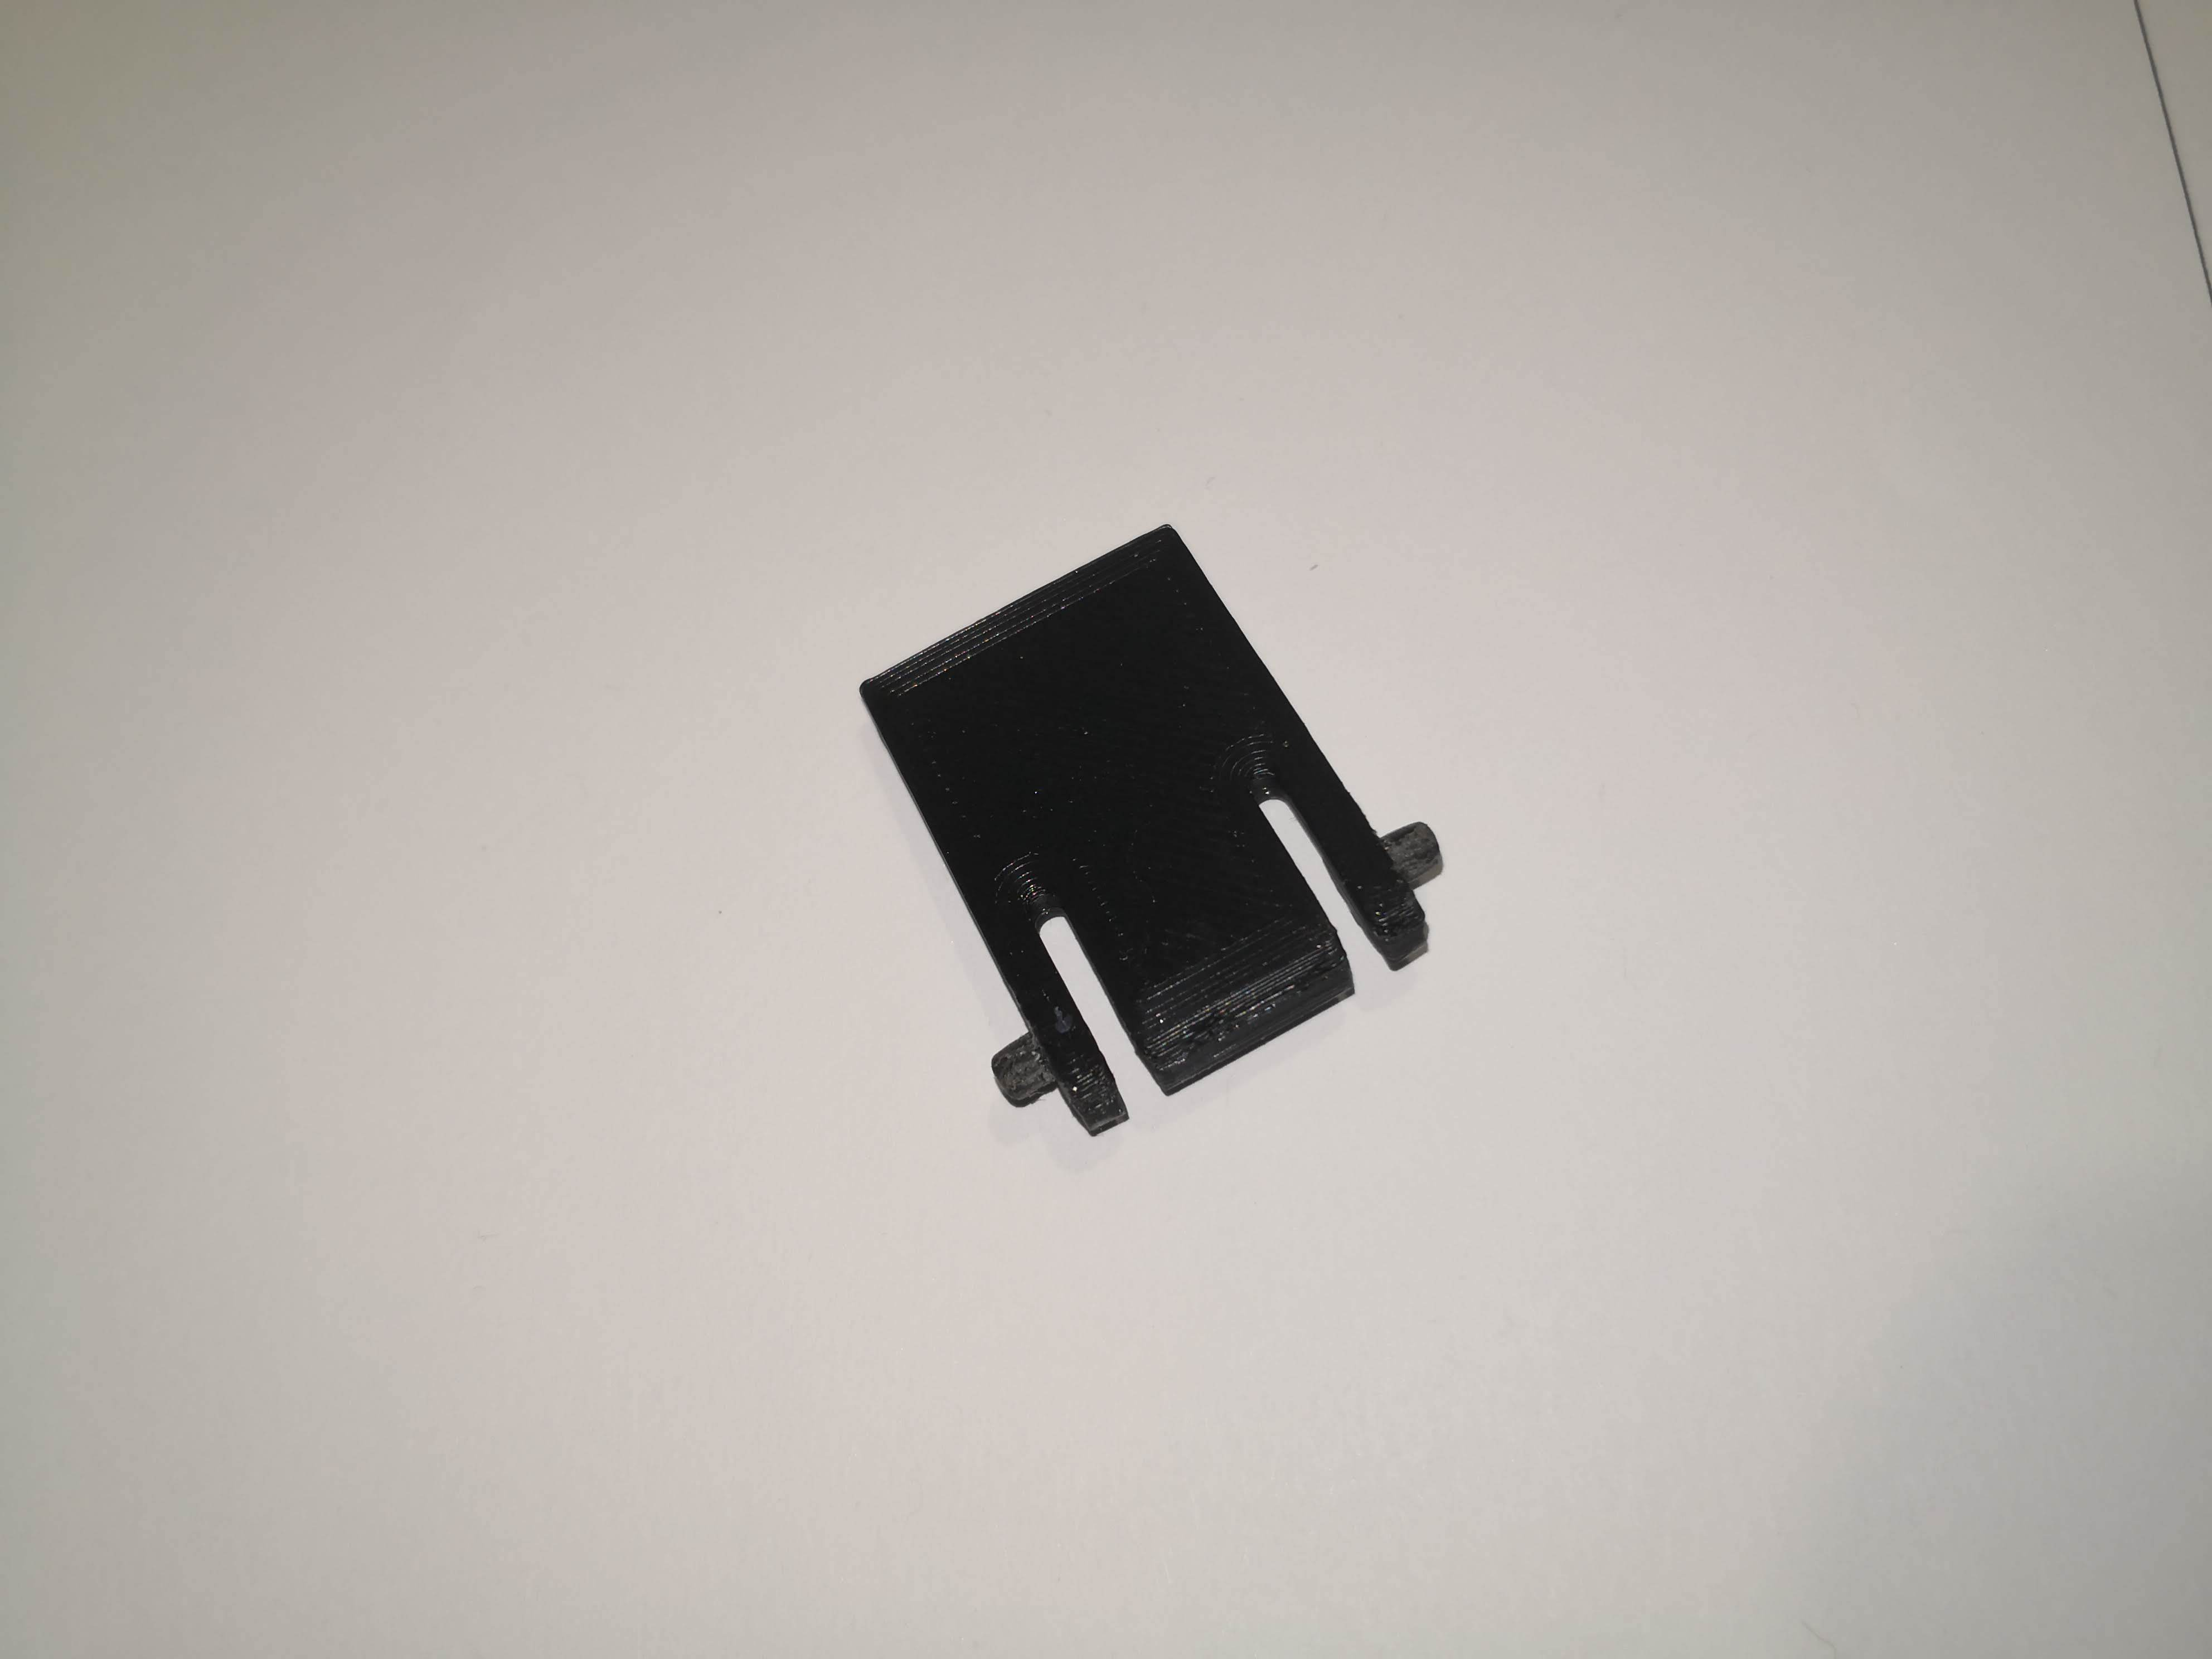 IMG_20200323_190356.jpg Download free STL file Keyboard stand Roccat Isku • 3D printing design, Icedragon